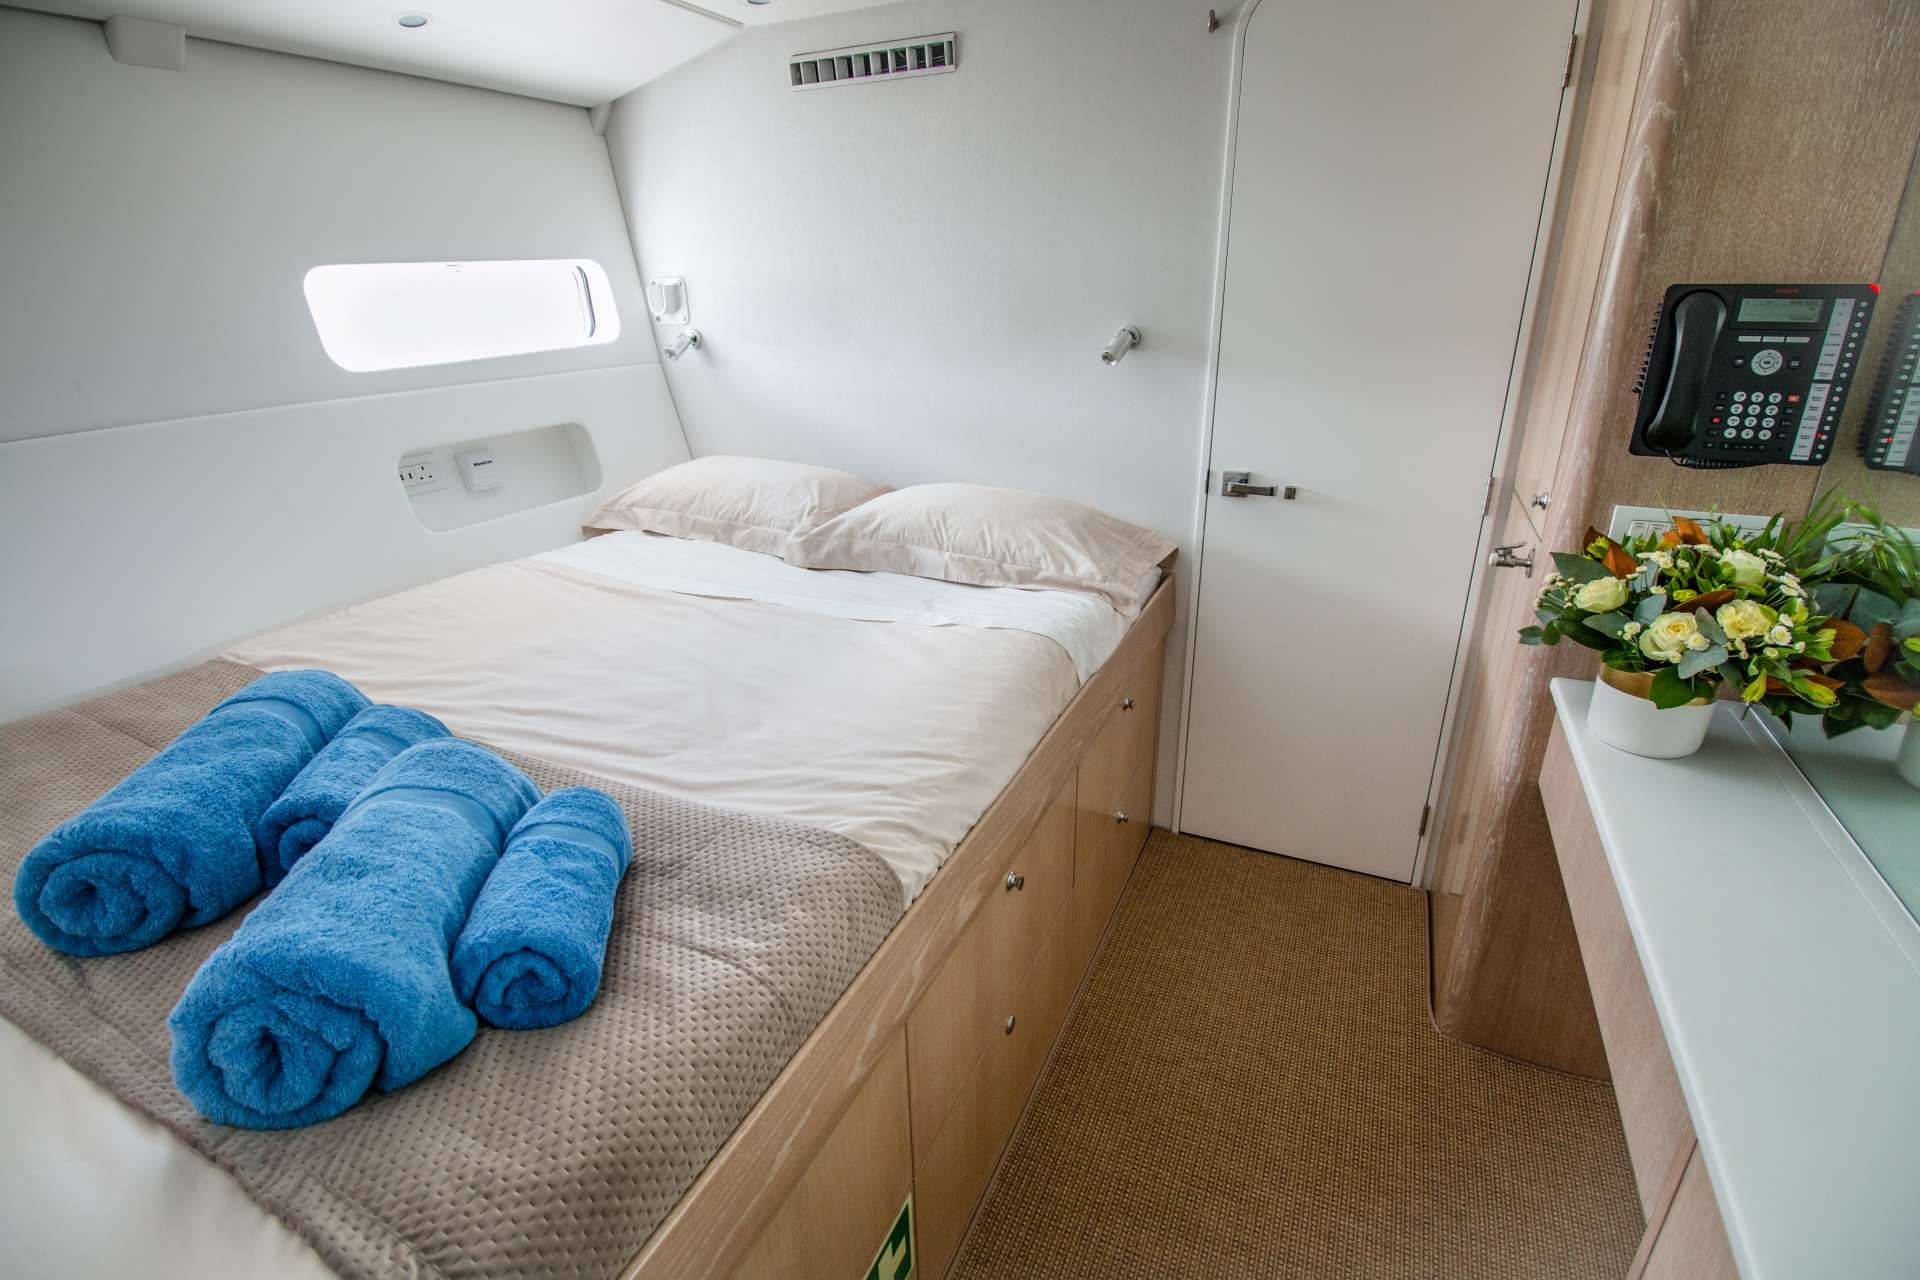 Guest queen cabins have fine linens